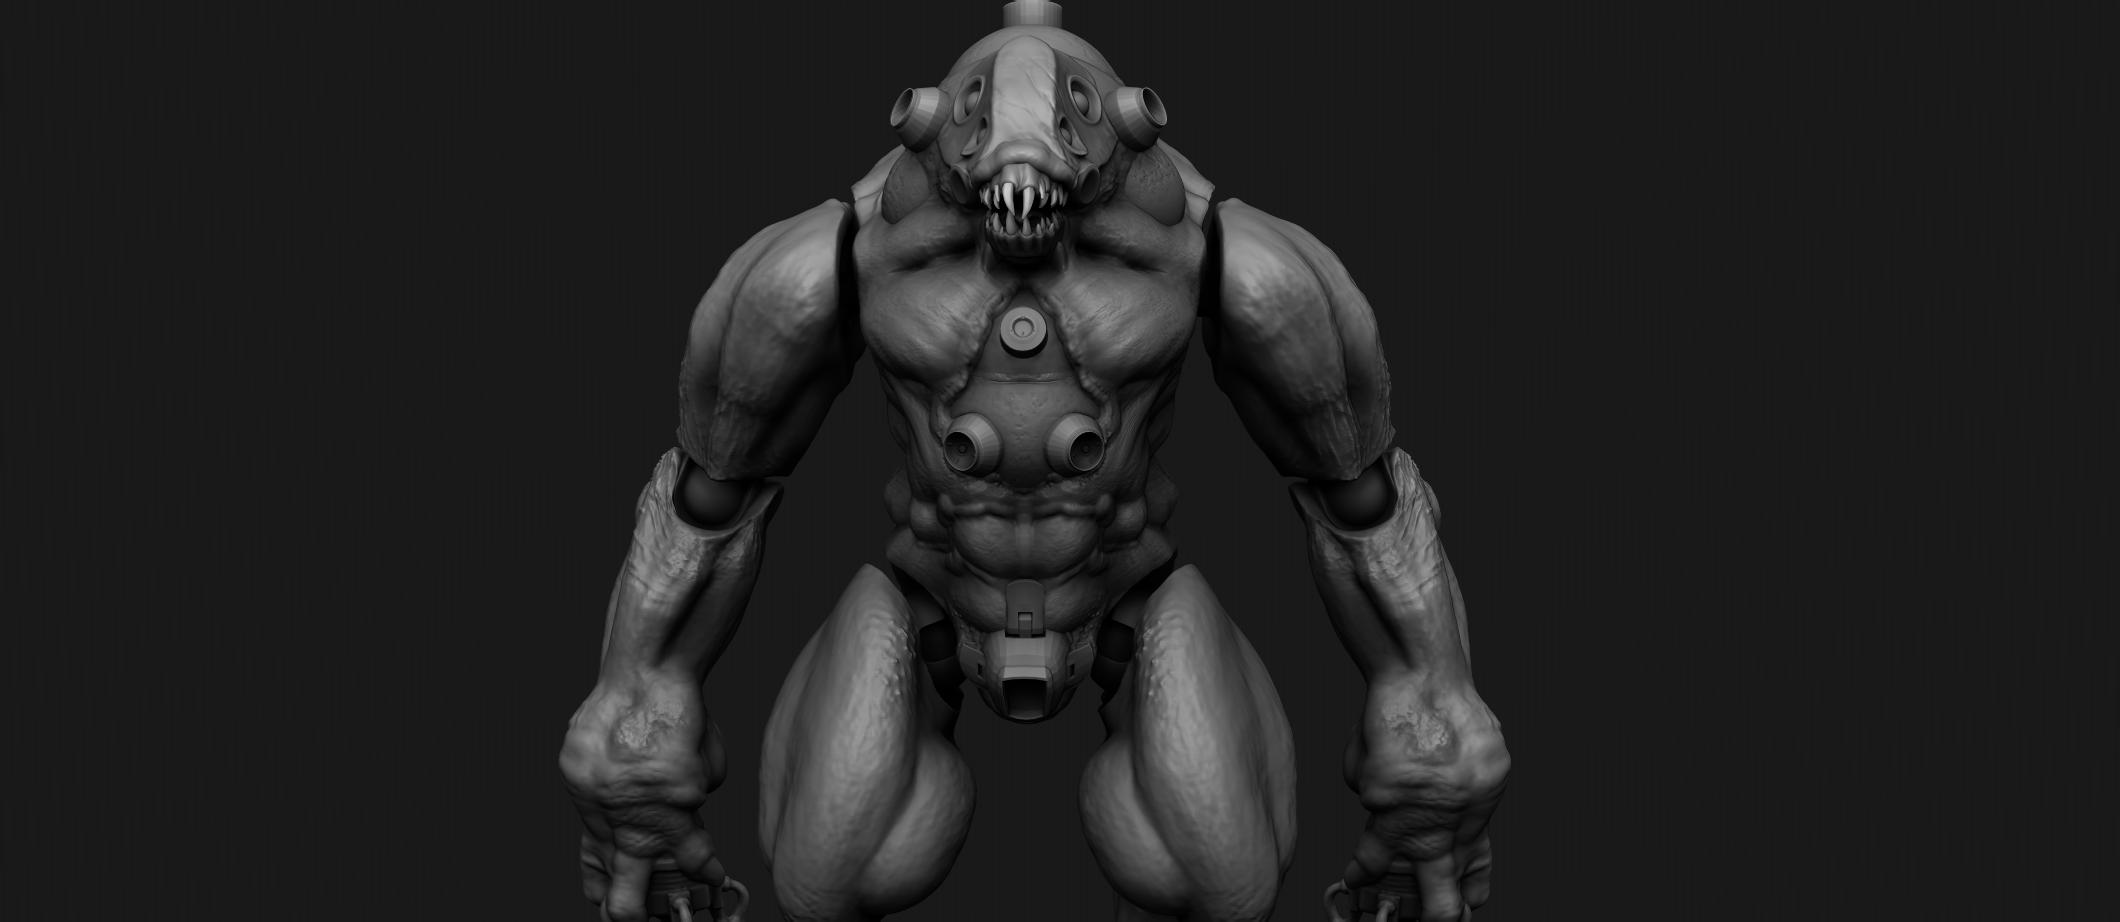 bigmanbigboyman.png Download STL file NECRONAUTS: Jotun action figure • 3D printing template, necronautsstudios